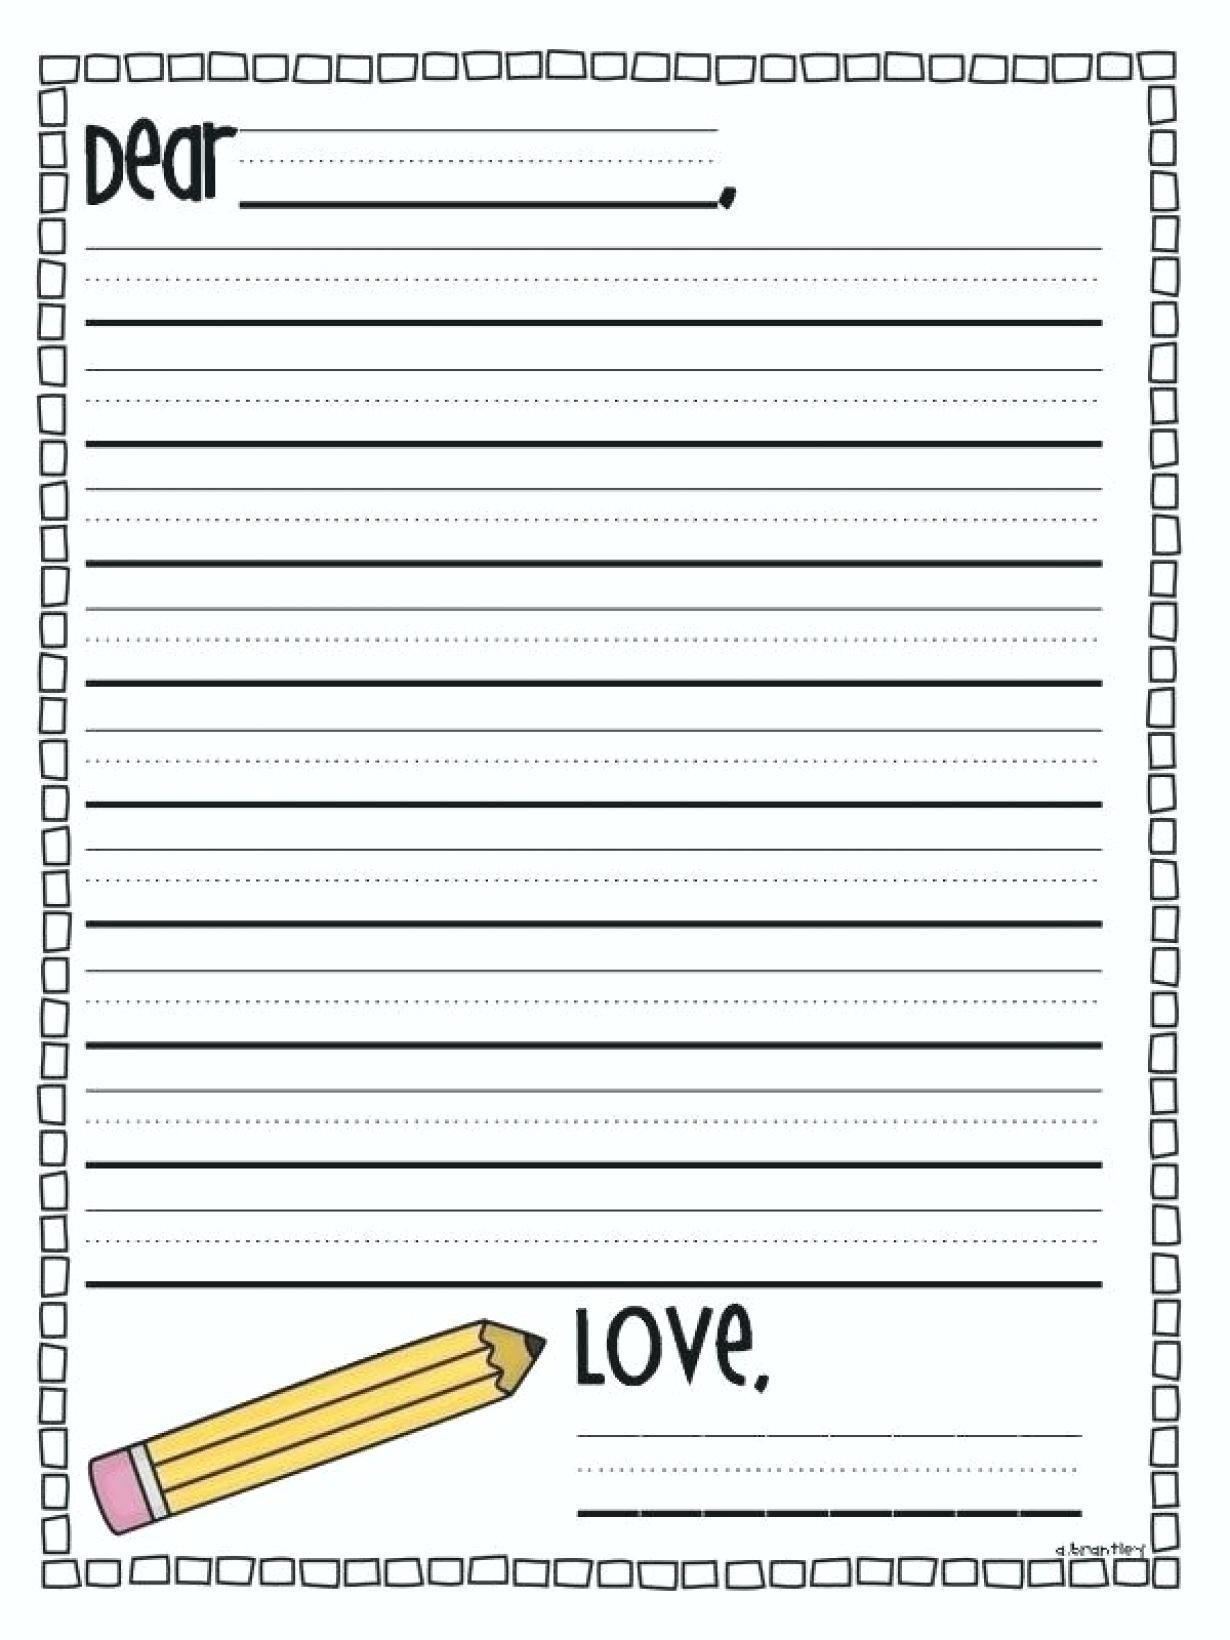 Printable Writing Paper First Grade – Shoppingfoorme.club - Free Printable Handwriting Paper For First Grade